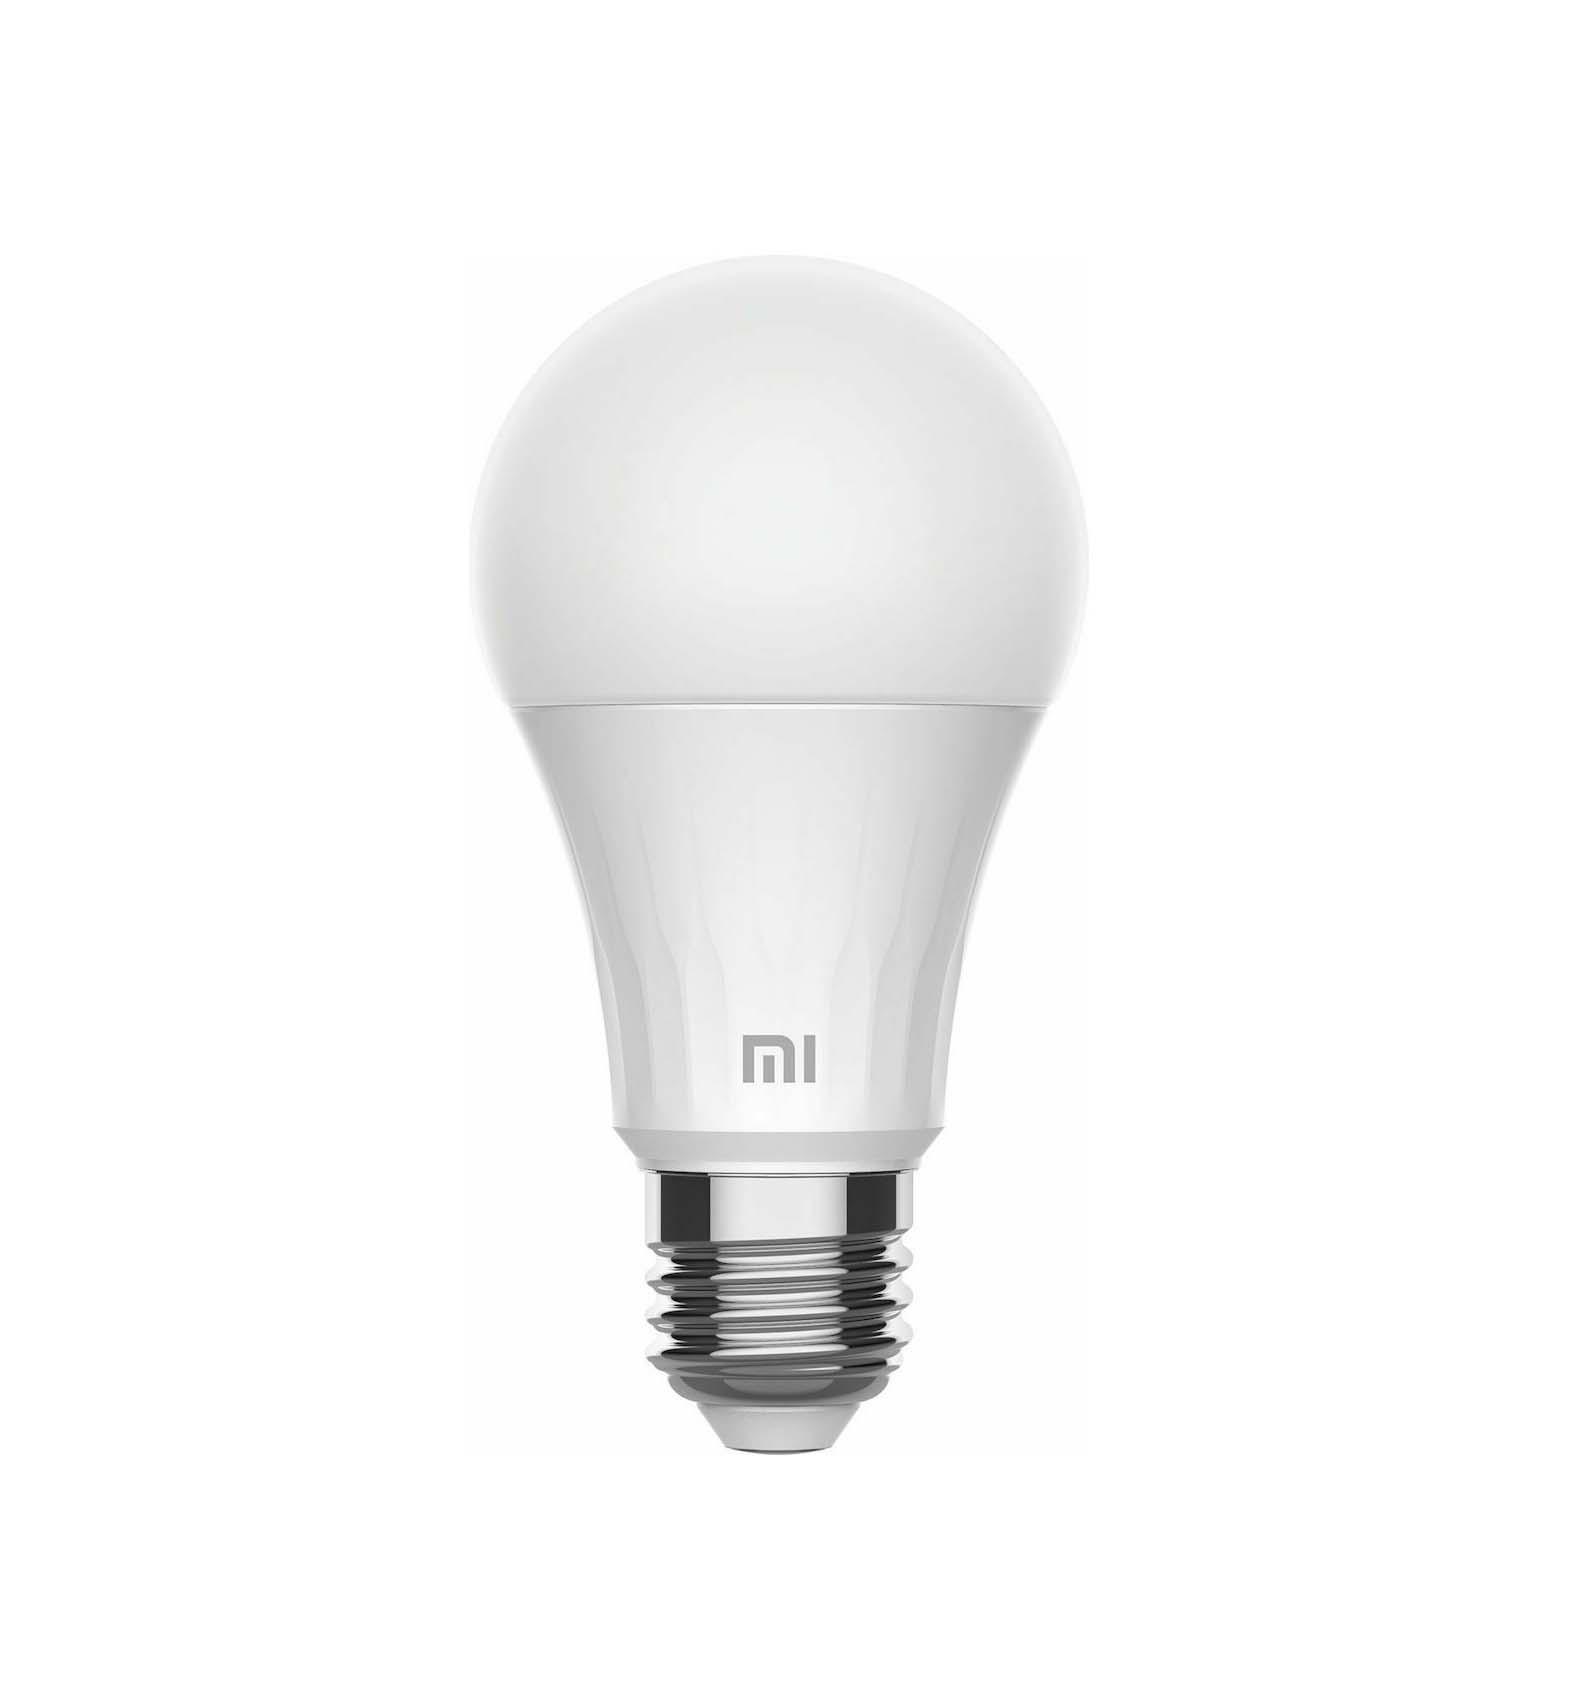 Xiaomi Mi Smart LED Bulb Warm White E27 8W GPX4026GL